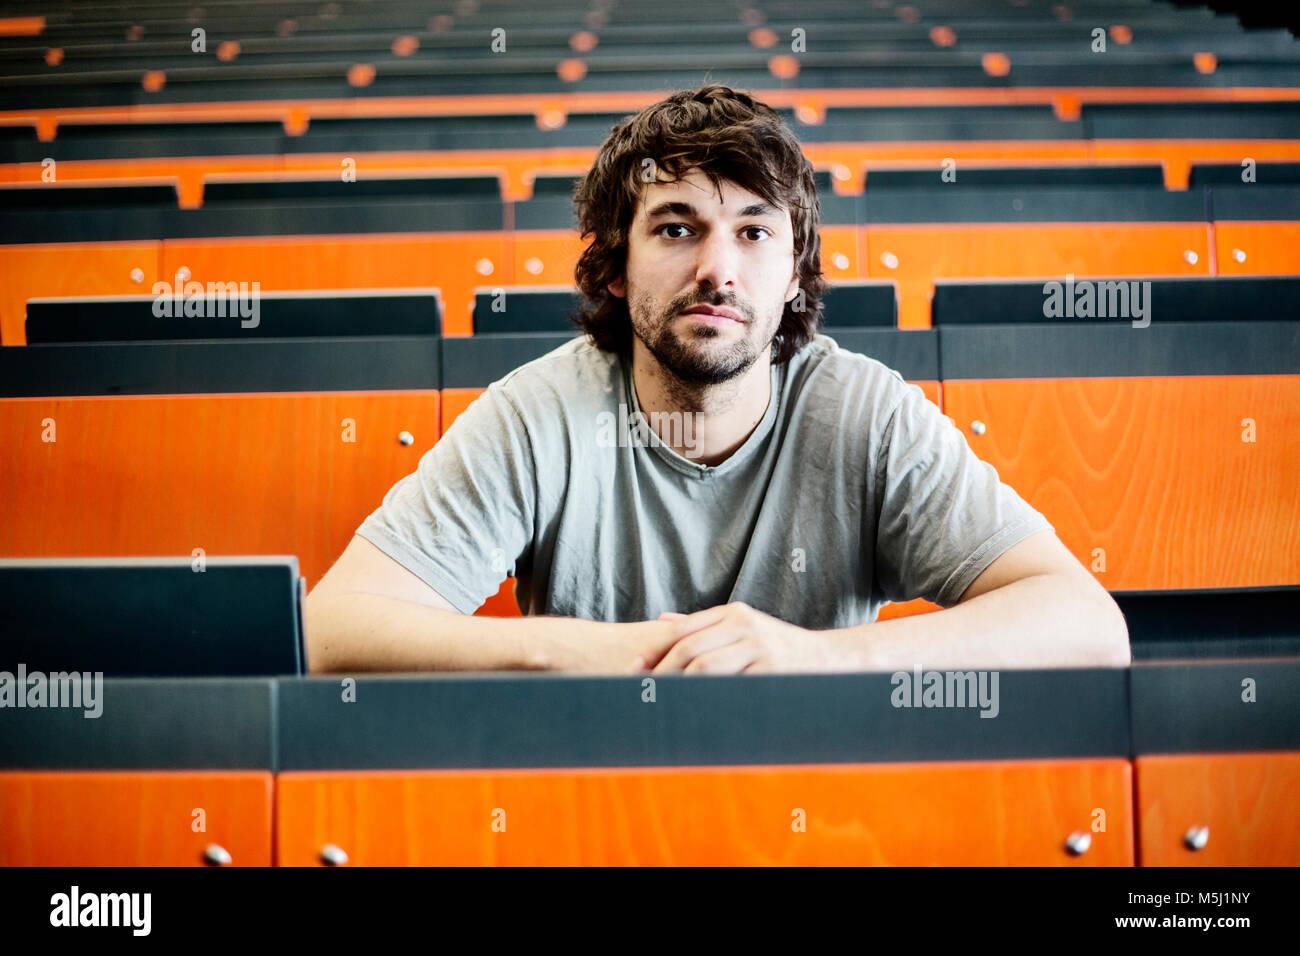 Portrait of student in auditorium at university - Stock Image